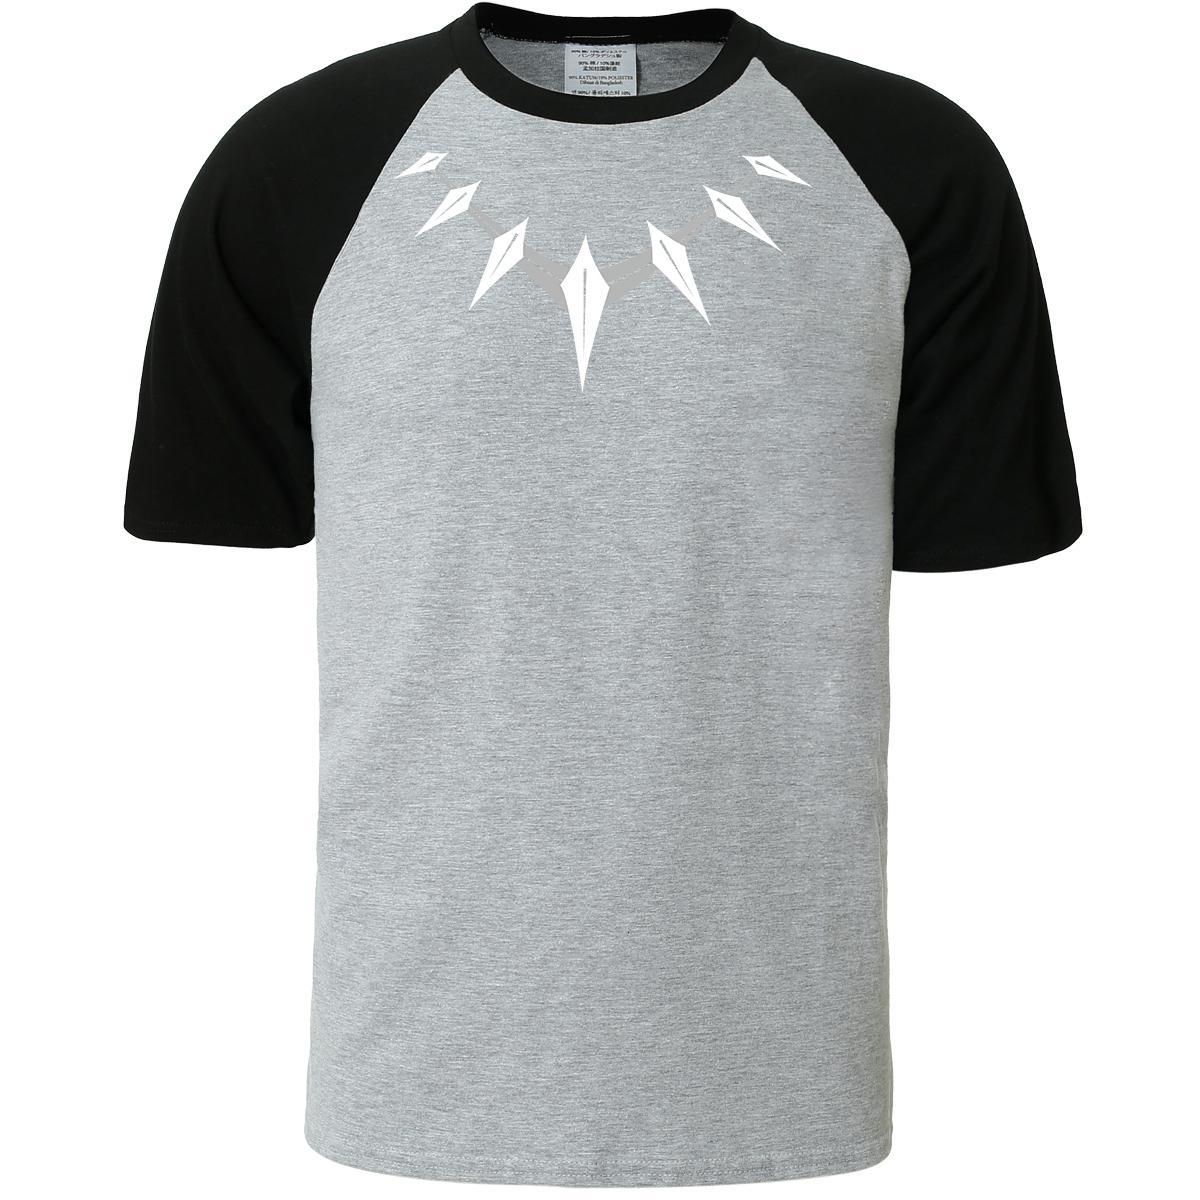 1791ff276a Superhero Avengers Civil War T-shirt Men 2019 New Arrival Streetwear Male T  Shirt Cotton Top Tee Shirt Harajuku Men s T-shirts